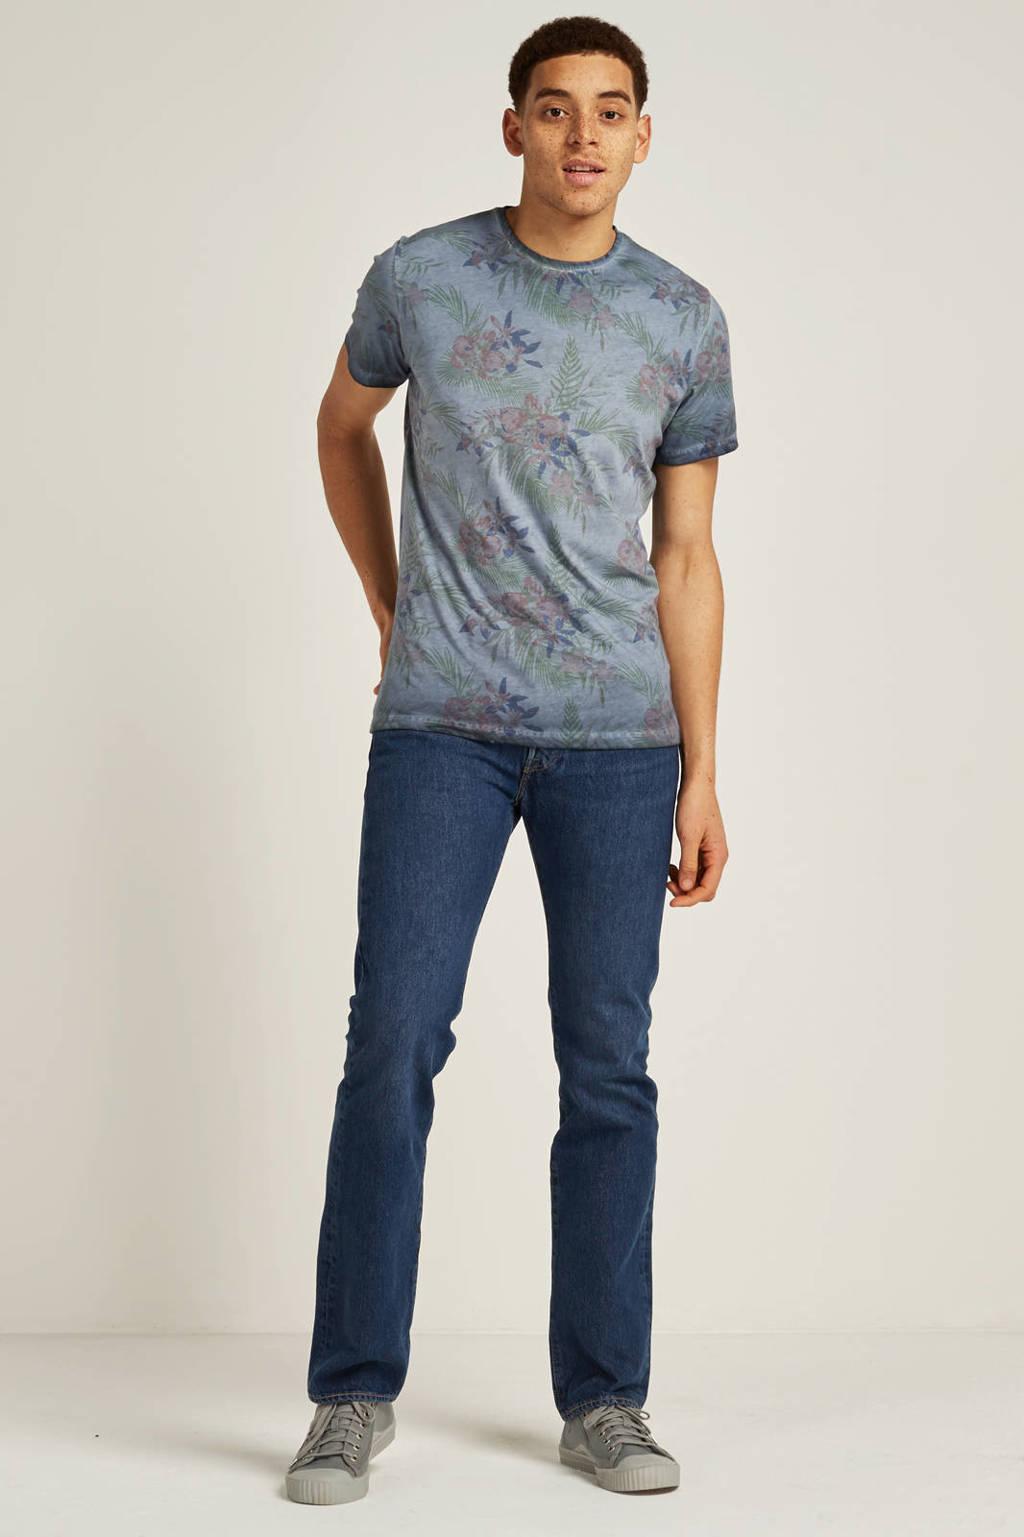 Levi's 501 original regular fit jeans, Subway Station